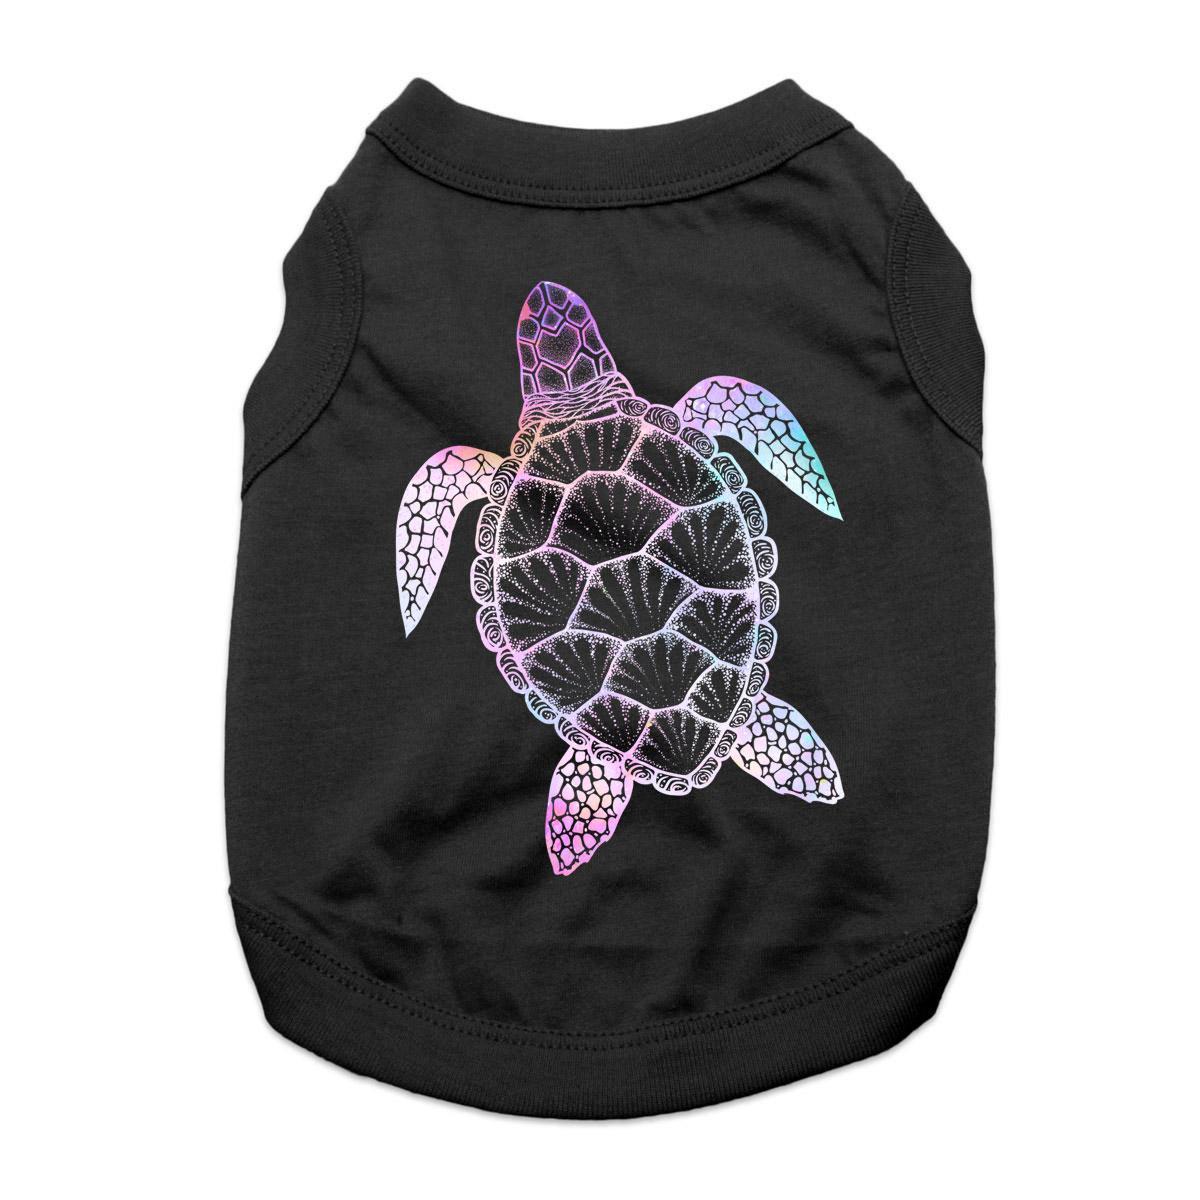 Galaxy Sea Turtle Dog Shirt - Black